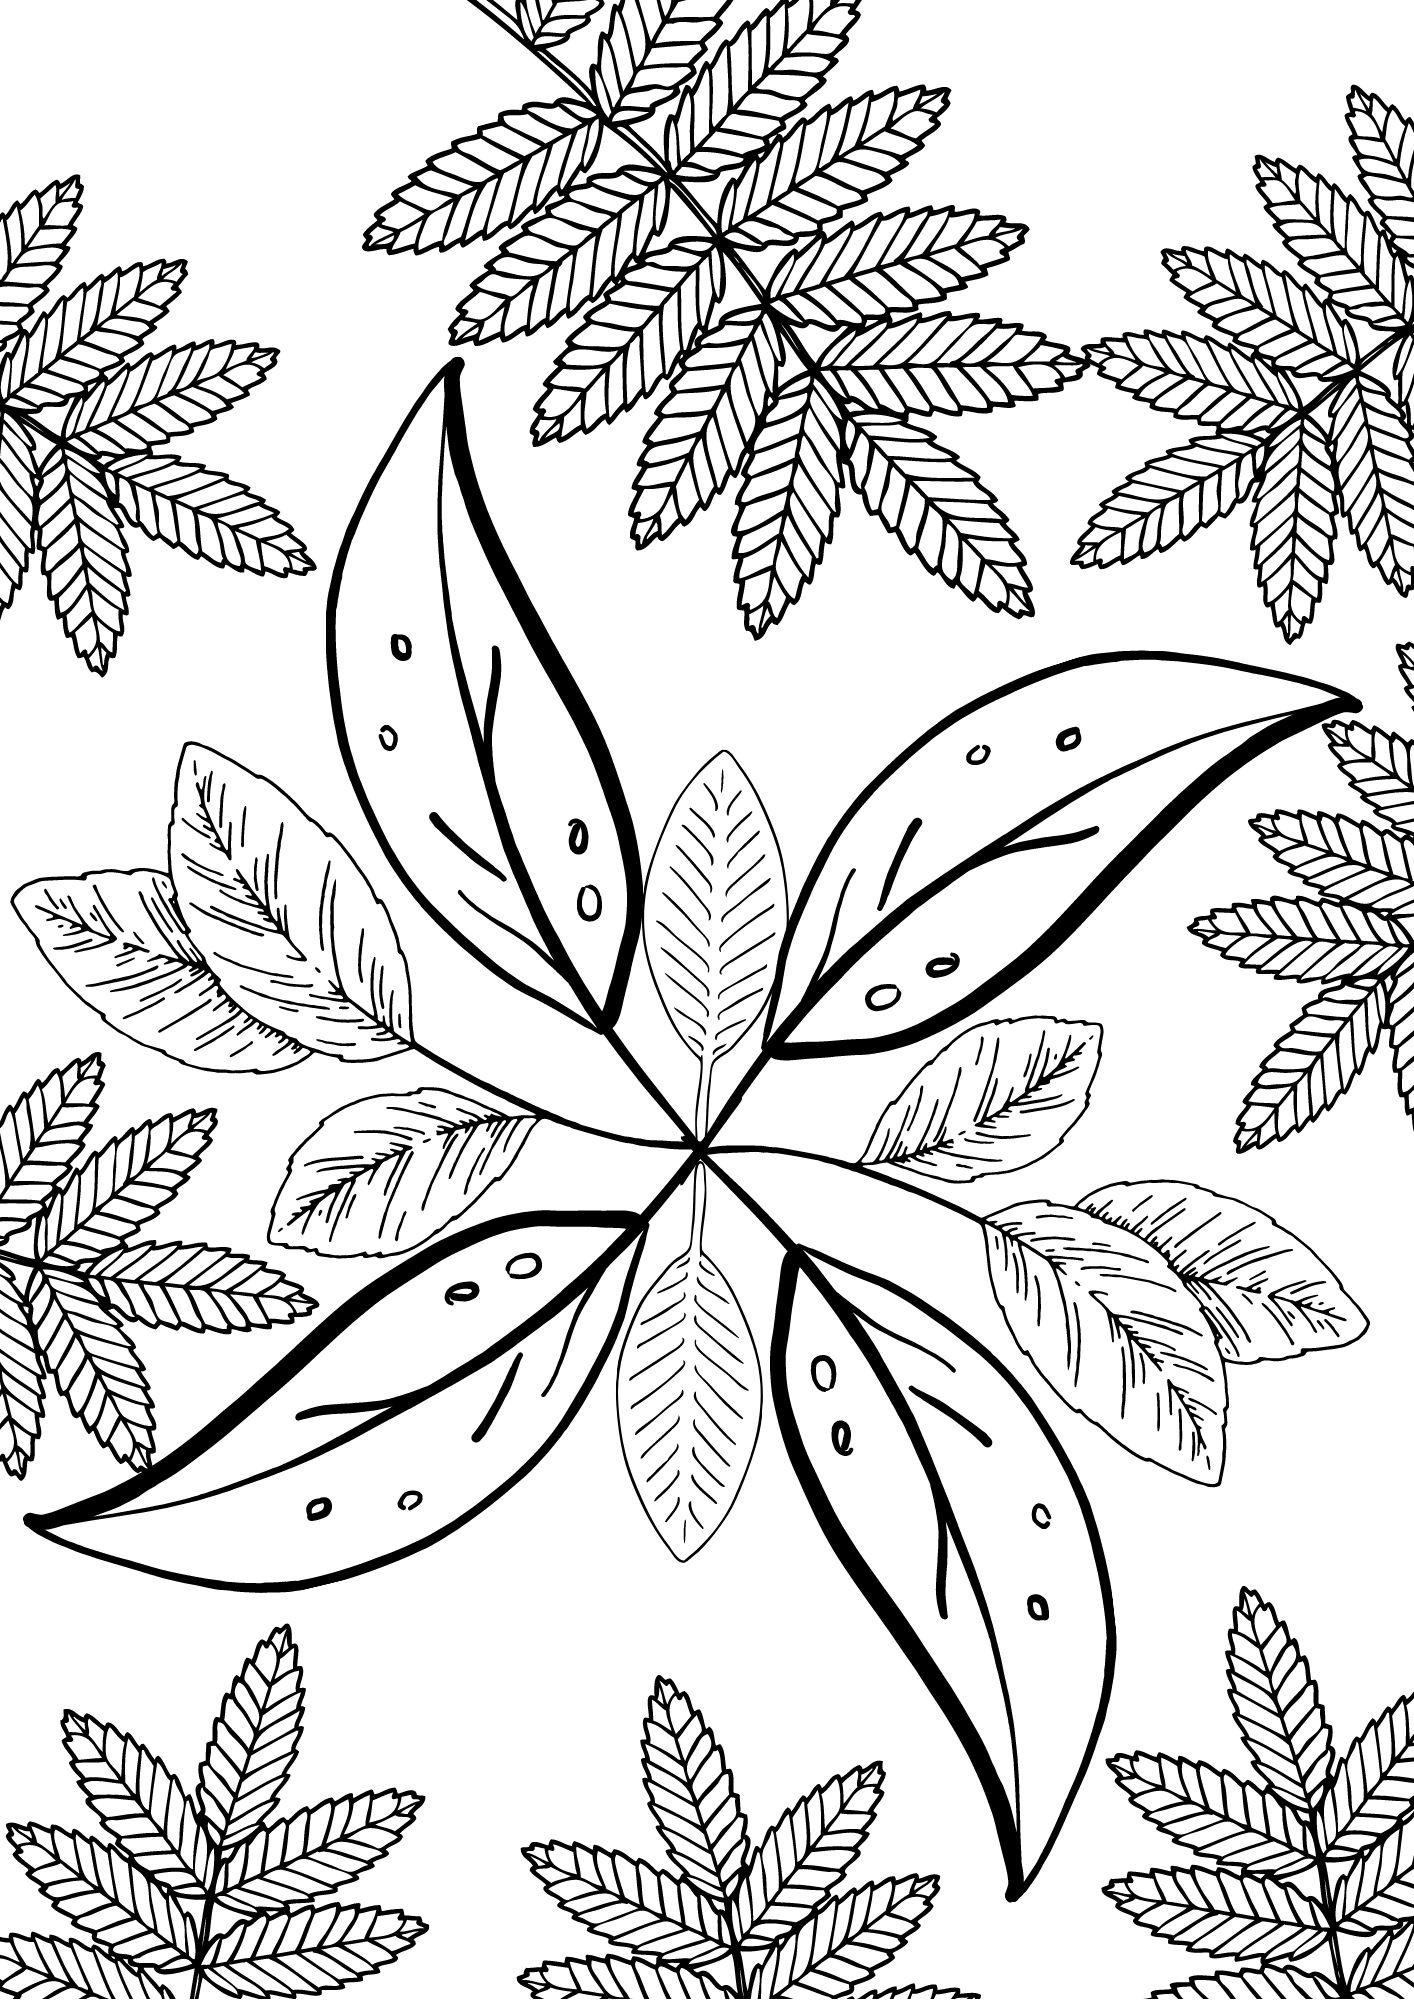 Sligo CTC Blog: Art with Catherine - Mindfulness Colouring